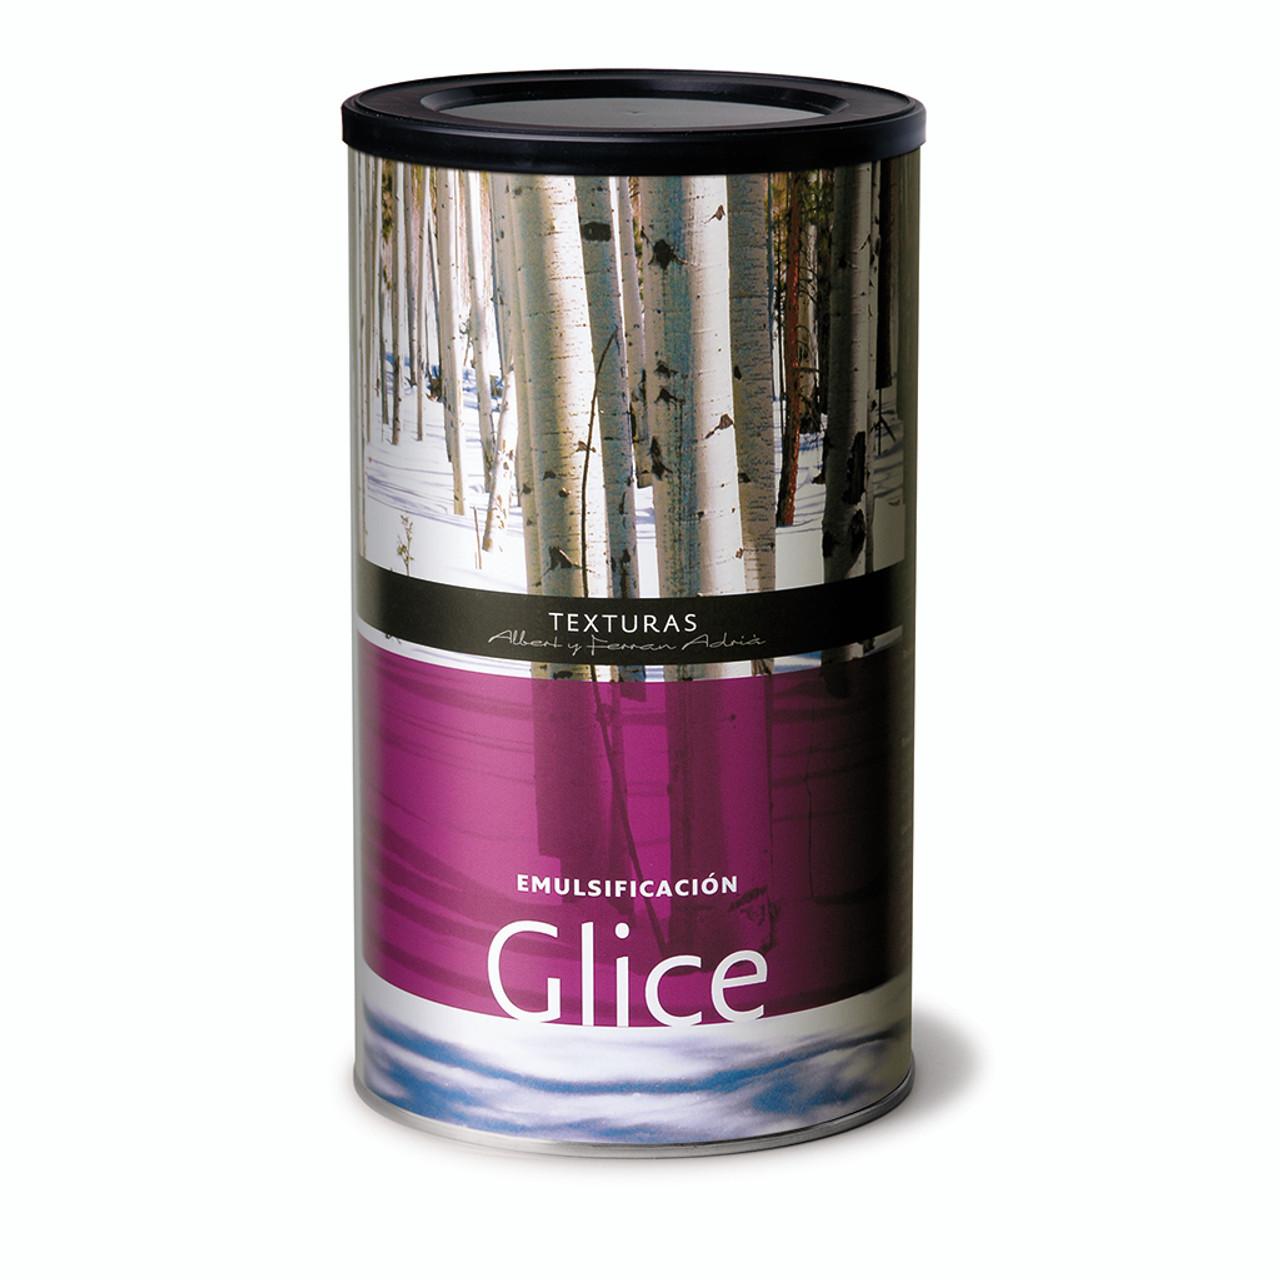 Texturas Glice 300g